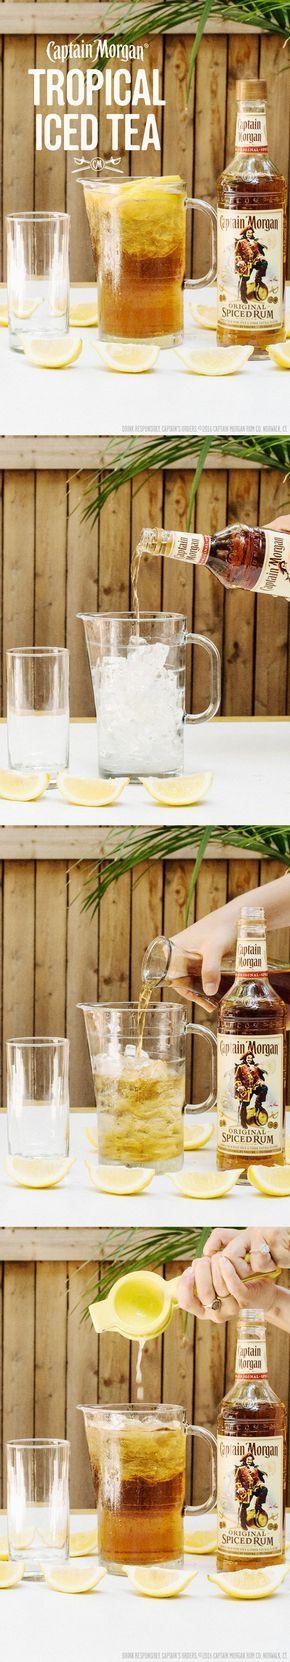 Impress your BBQ guests with this Tropical Iced Tea recipe: 1.5 oz Captain Morgan Original Spiced Rum 5 oz Ice Tea Squeeze of lemon  Get more rum recipes at https://us.captainmorgan.com/rum-cocktails/?utm_source=pinterest&utm_medium=social&utm_term=bbq&utm_content=tropical_tea&utm_campaign=recipe